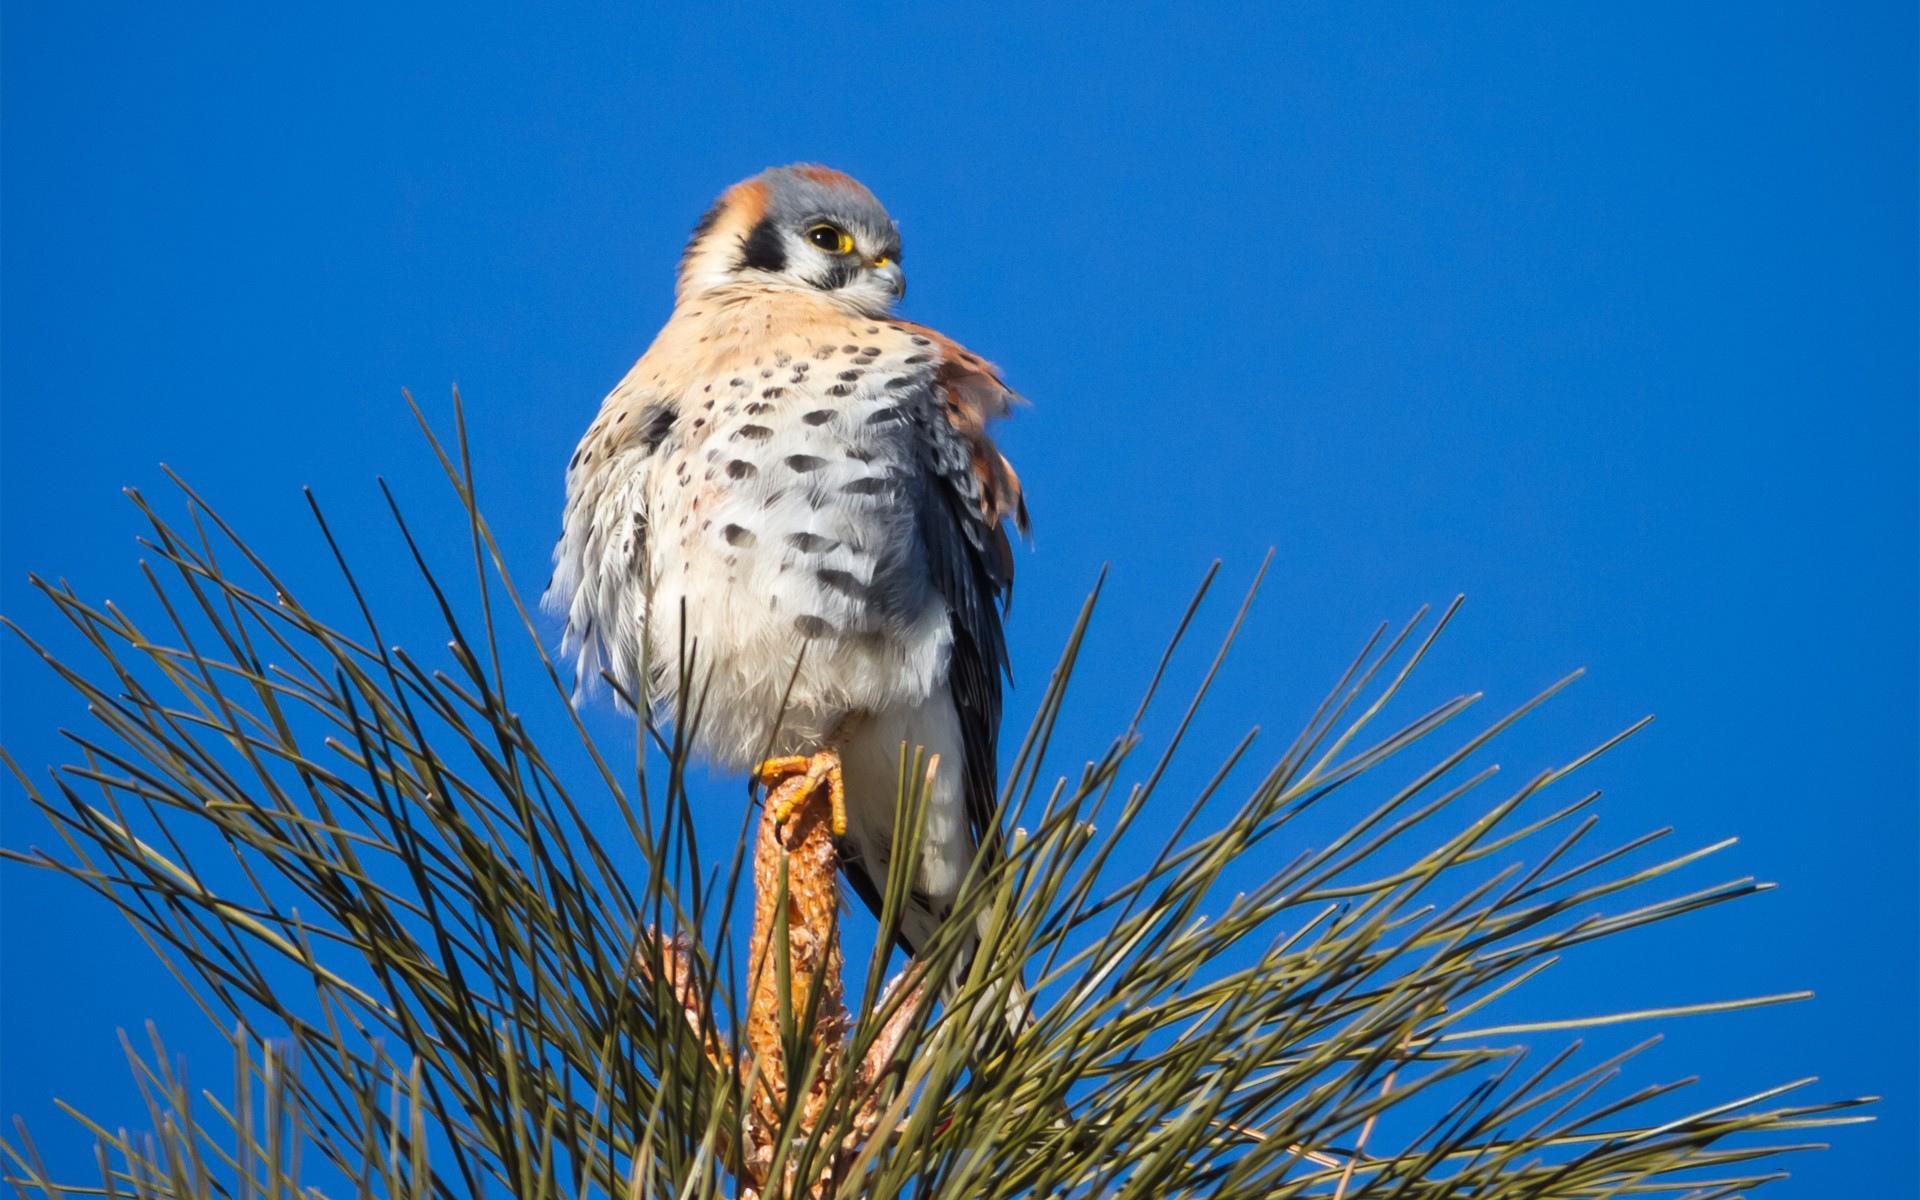 Falcon High Resolution Wallpapers: Falcon Wallpaper HD Download